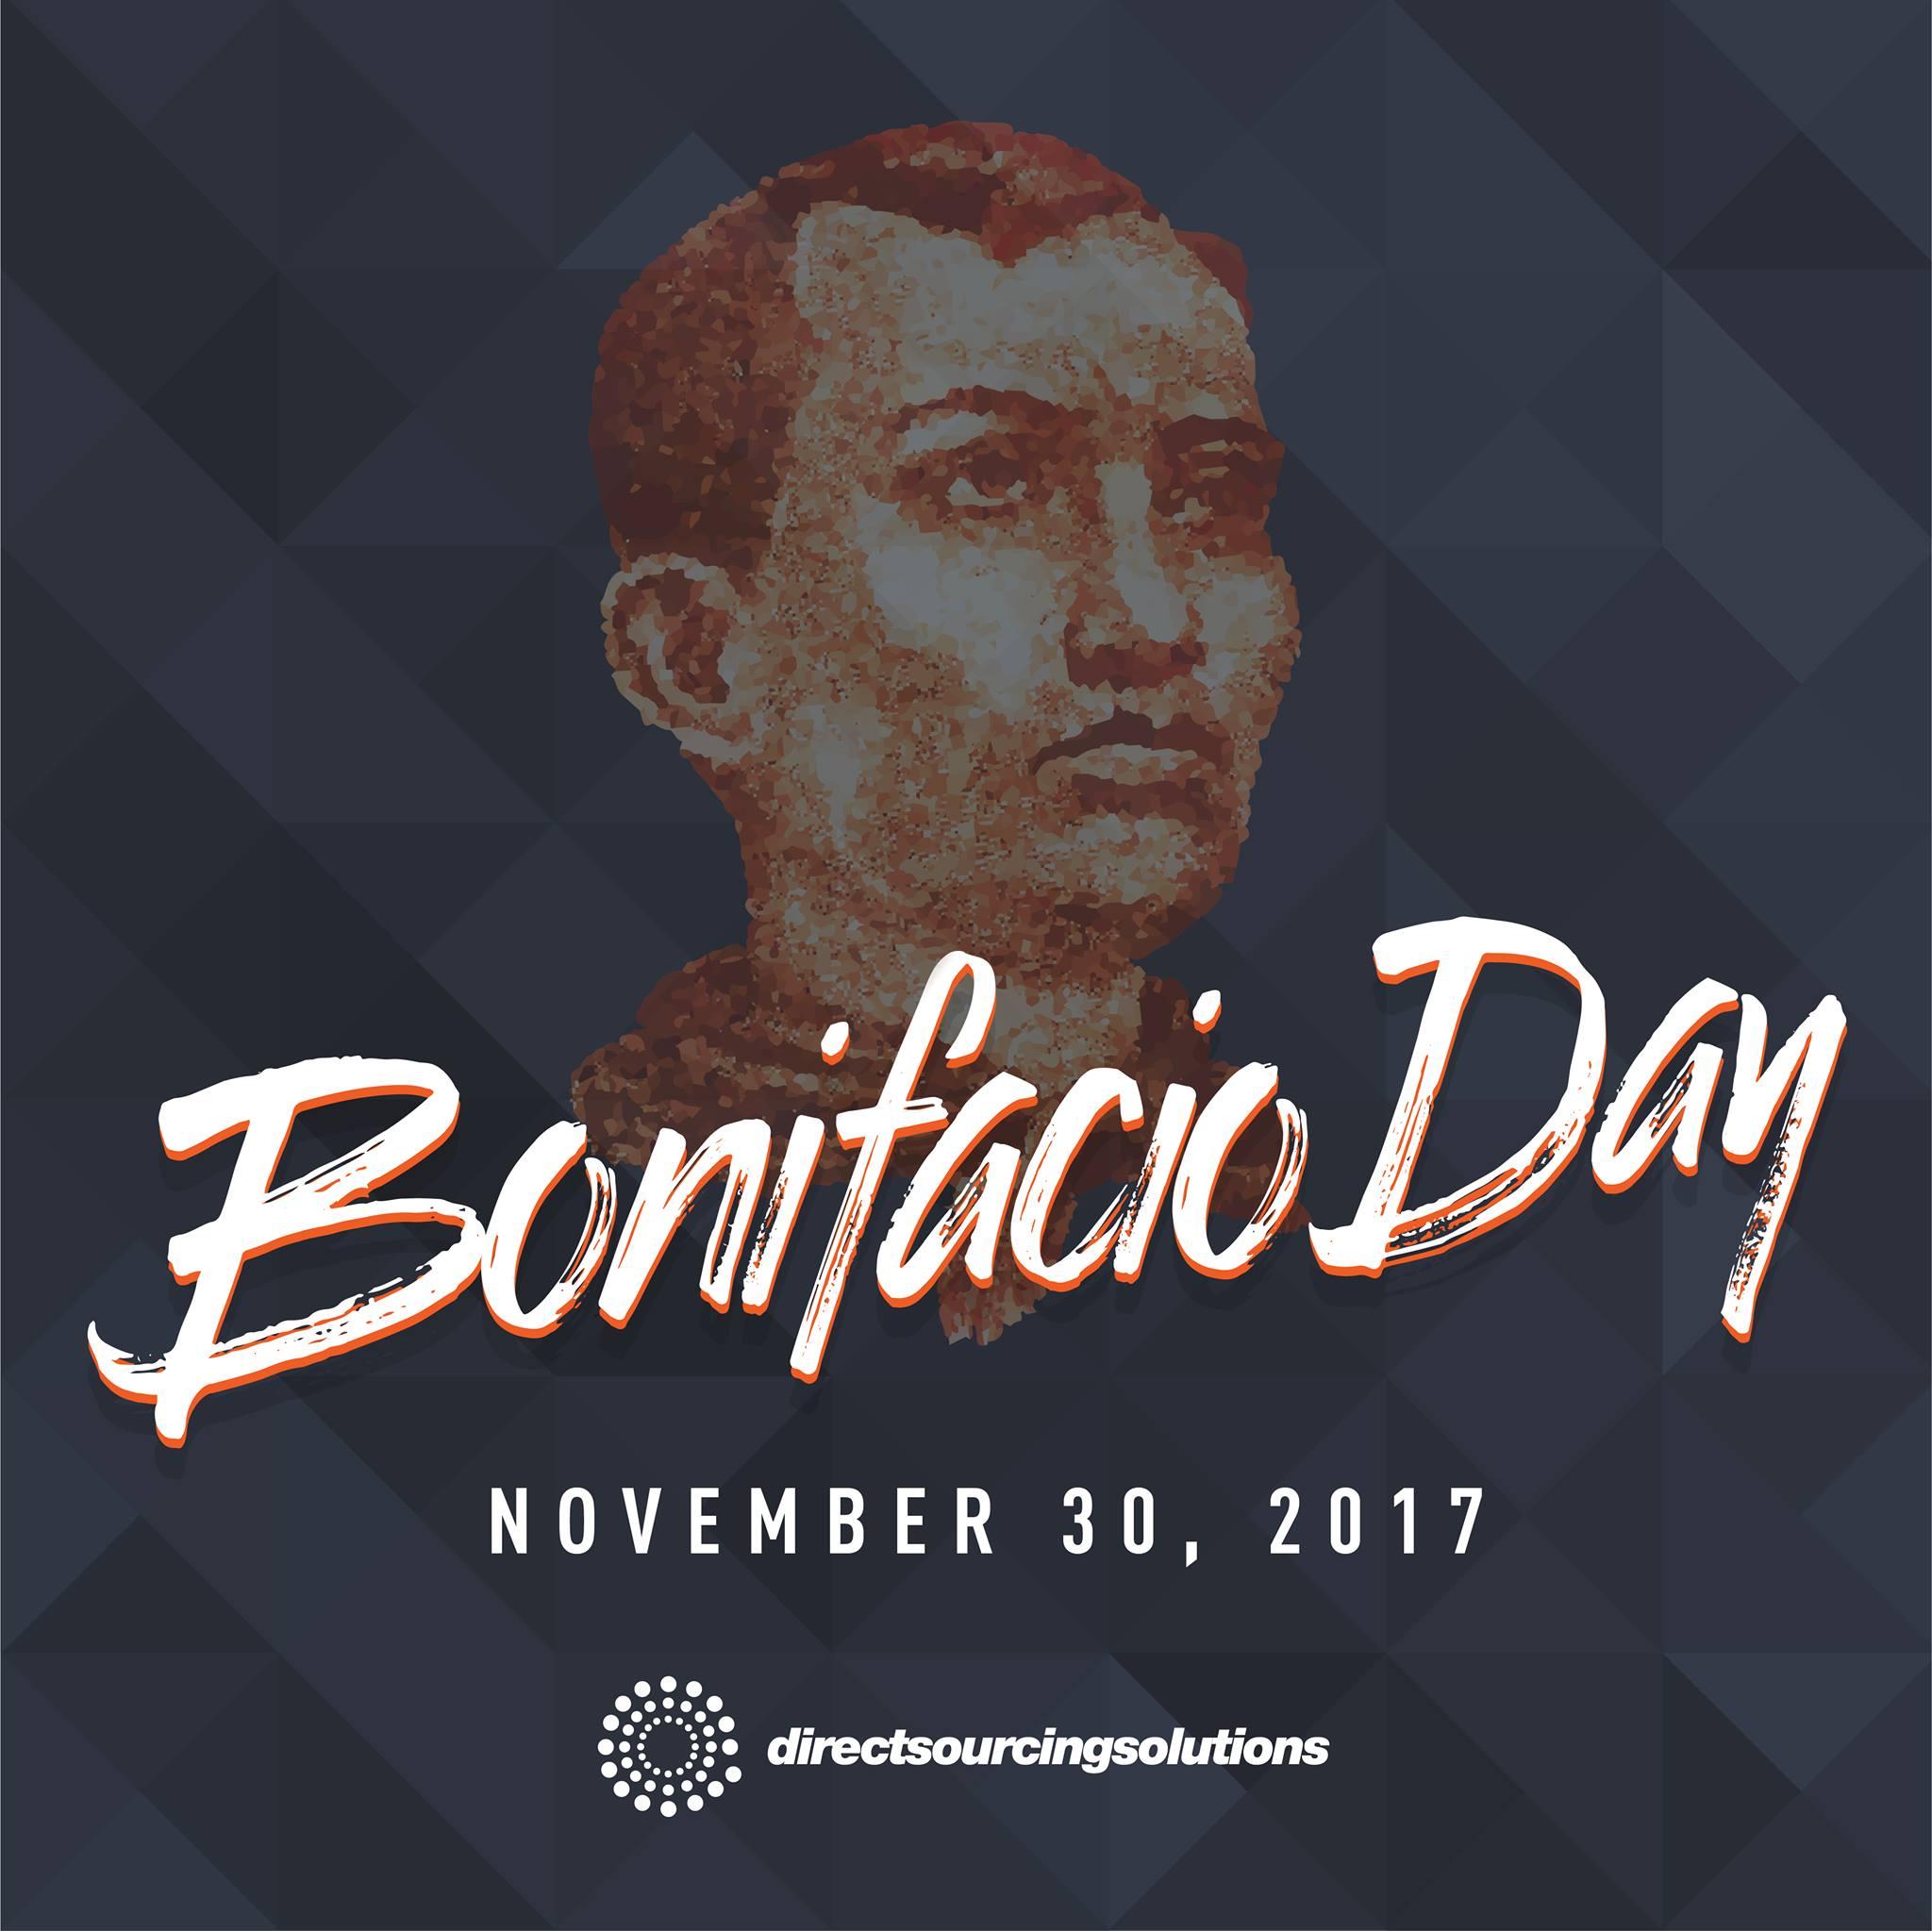 Design Advertisement - Bonifacio Day